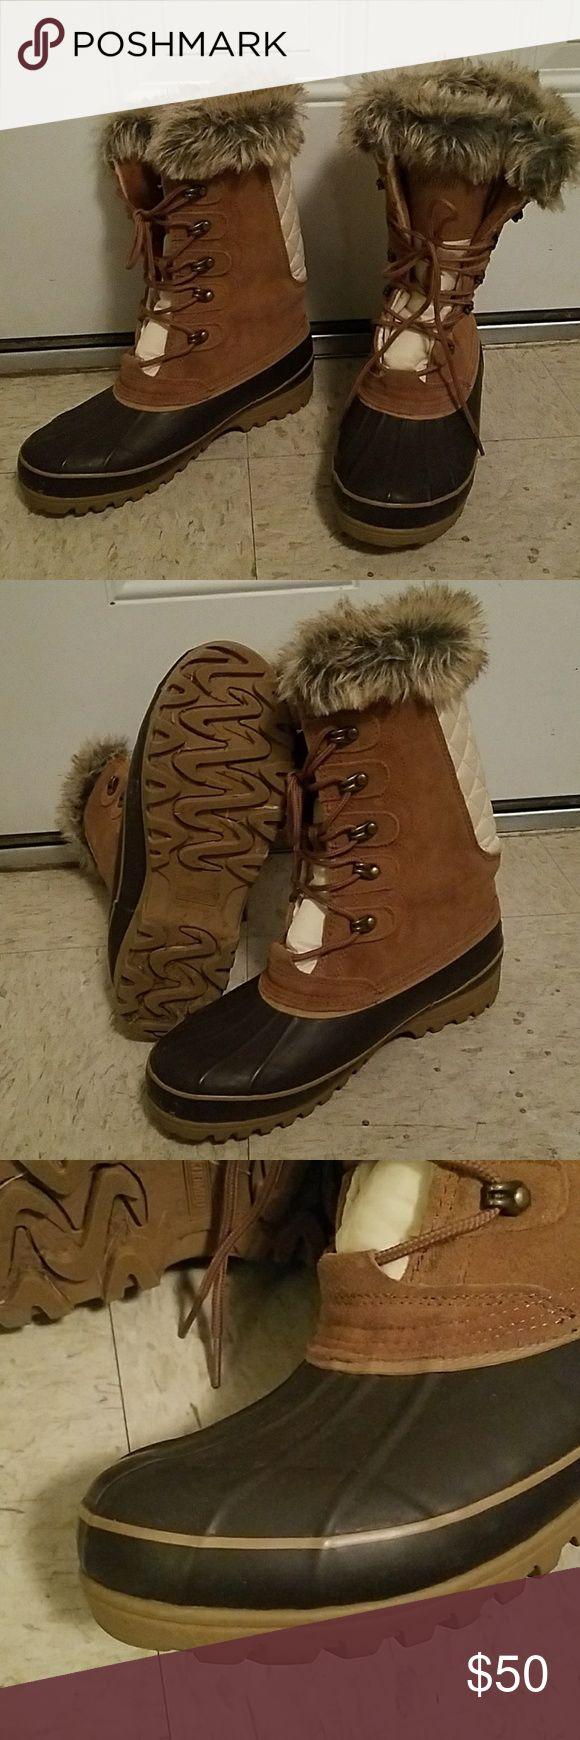 KHOMBU BOOTS GOOD CONDITION KHOMBU BOOTS Khombu Shoes Winter & Rain Boots